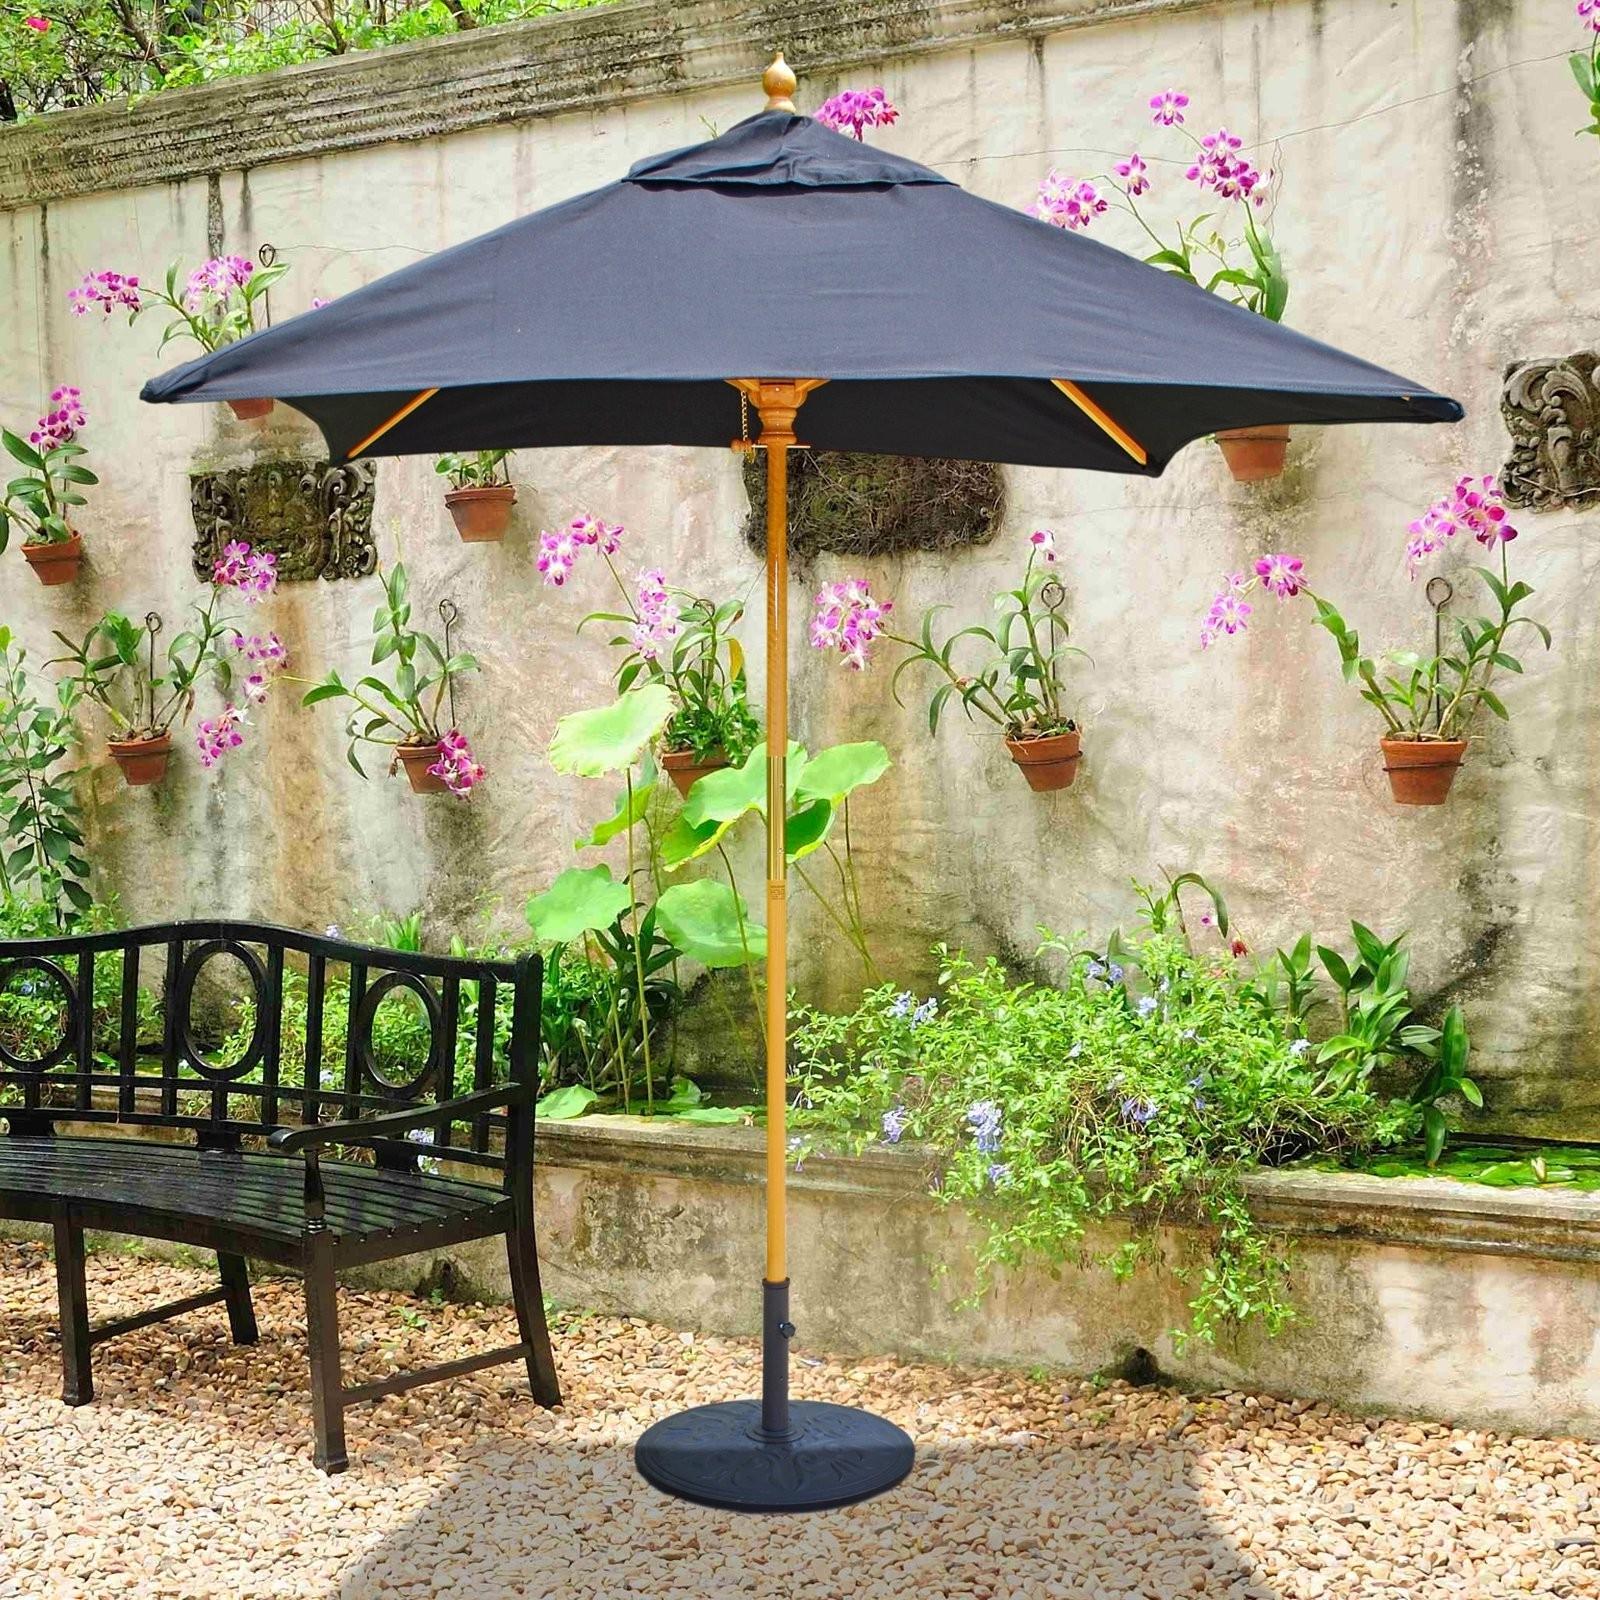 Galtech Sunbrella 6 X 6 Ft Wood Square Patio Umbrella Patio Throughout Recent 6 Ft Patio Umbrellas (View 11 of 20)